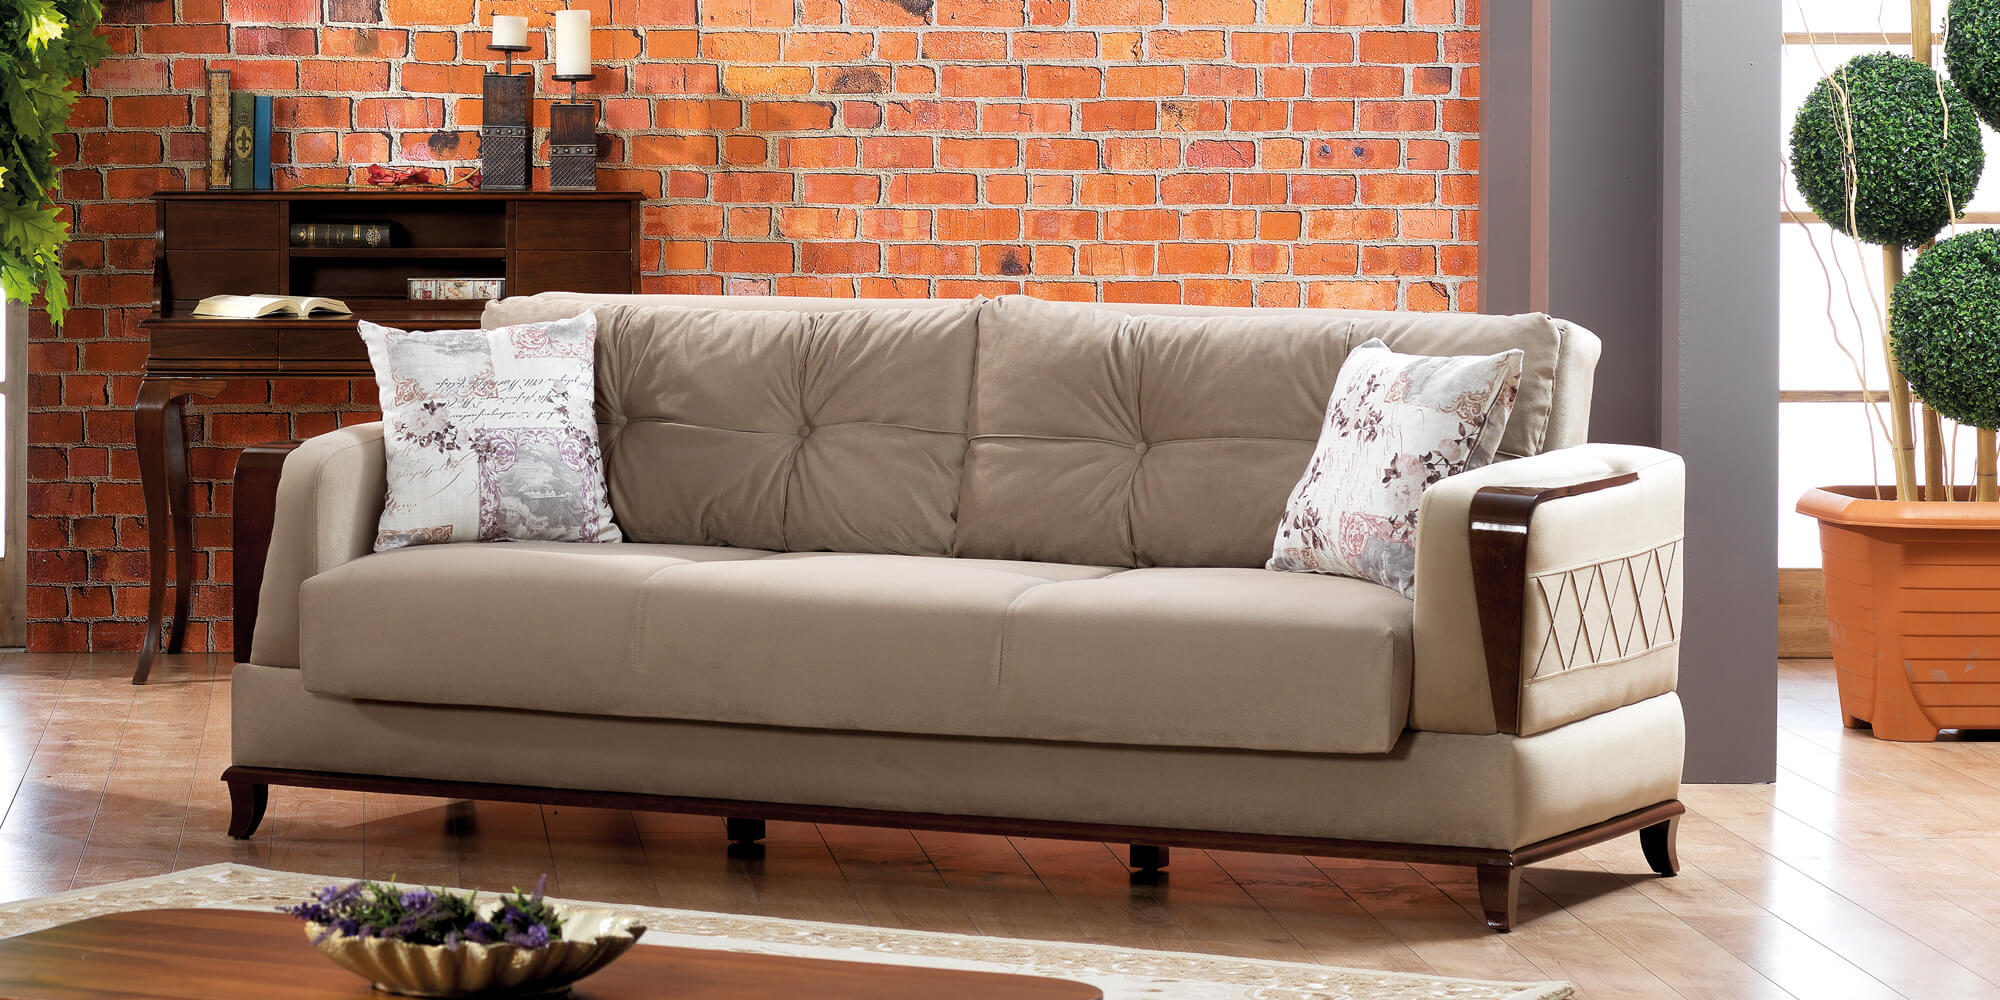 tone 3 2 1 delux sofa set yuvam m belhaus in wuppertal cilek offizieller h ndler in europa. Black Bedroom Furniture Sets. Home Design Ideas